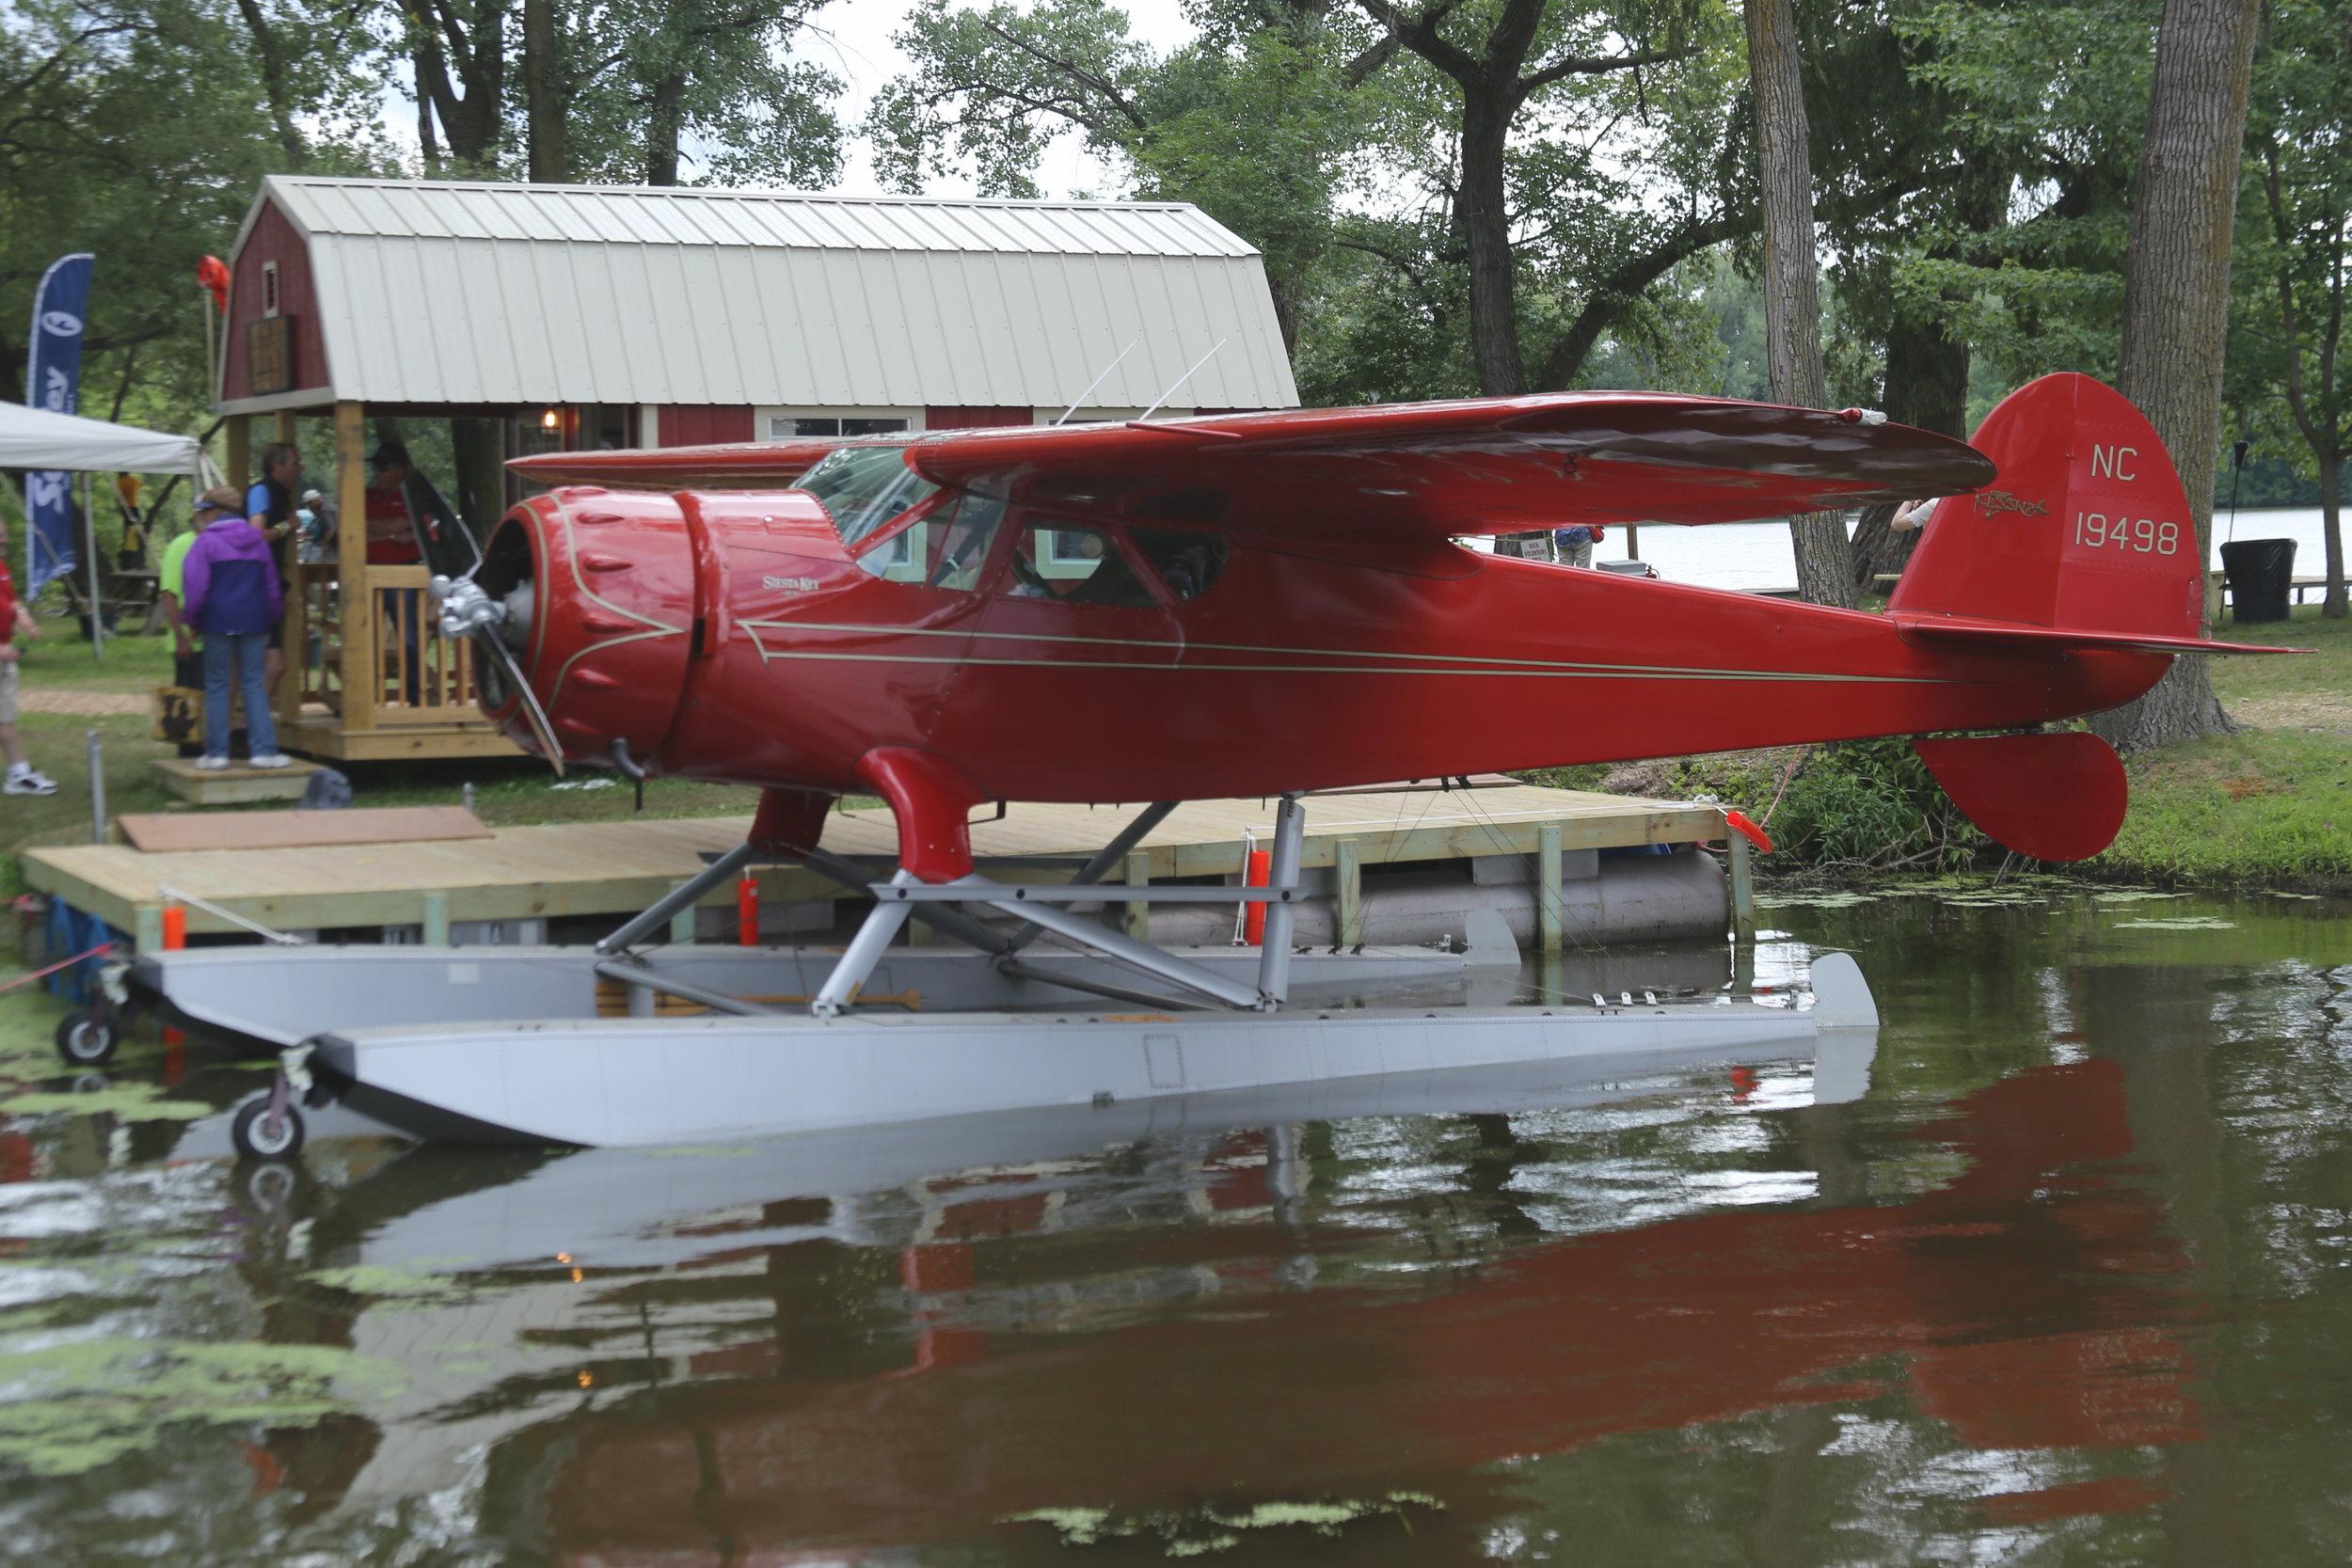 NC19498 Cessna165F taken at Lake Winnibago Oshkosh 26th July 2018 by John Wood